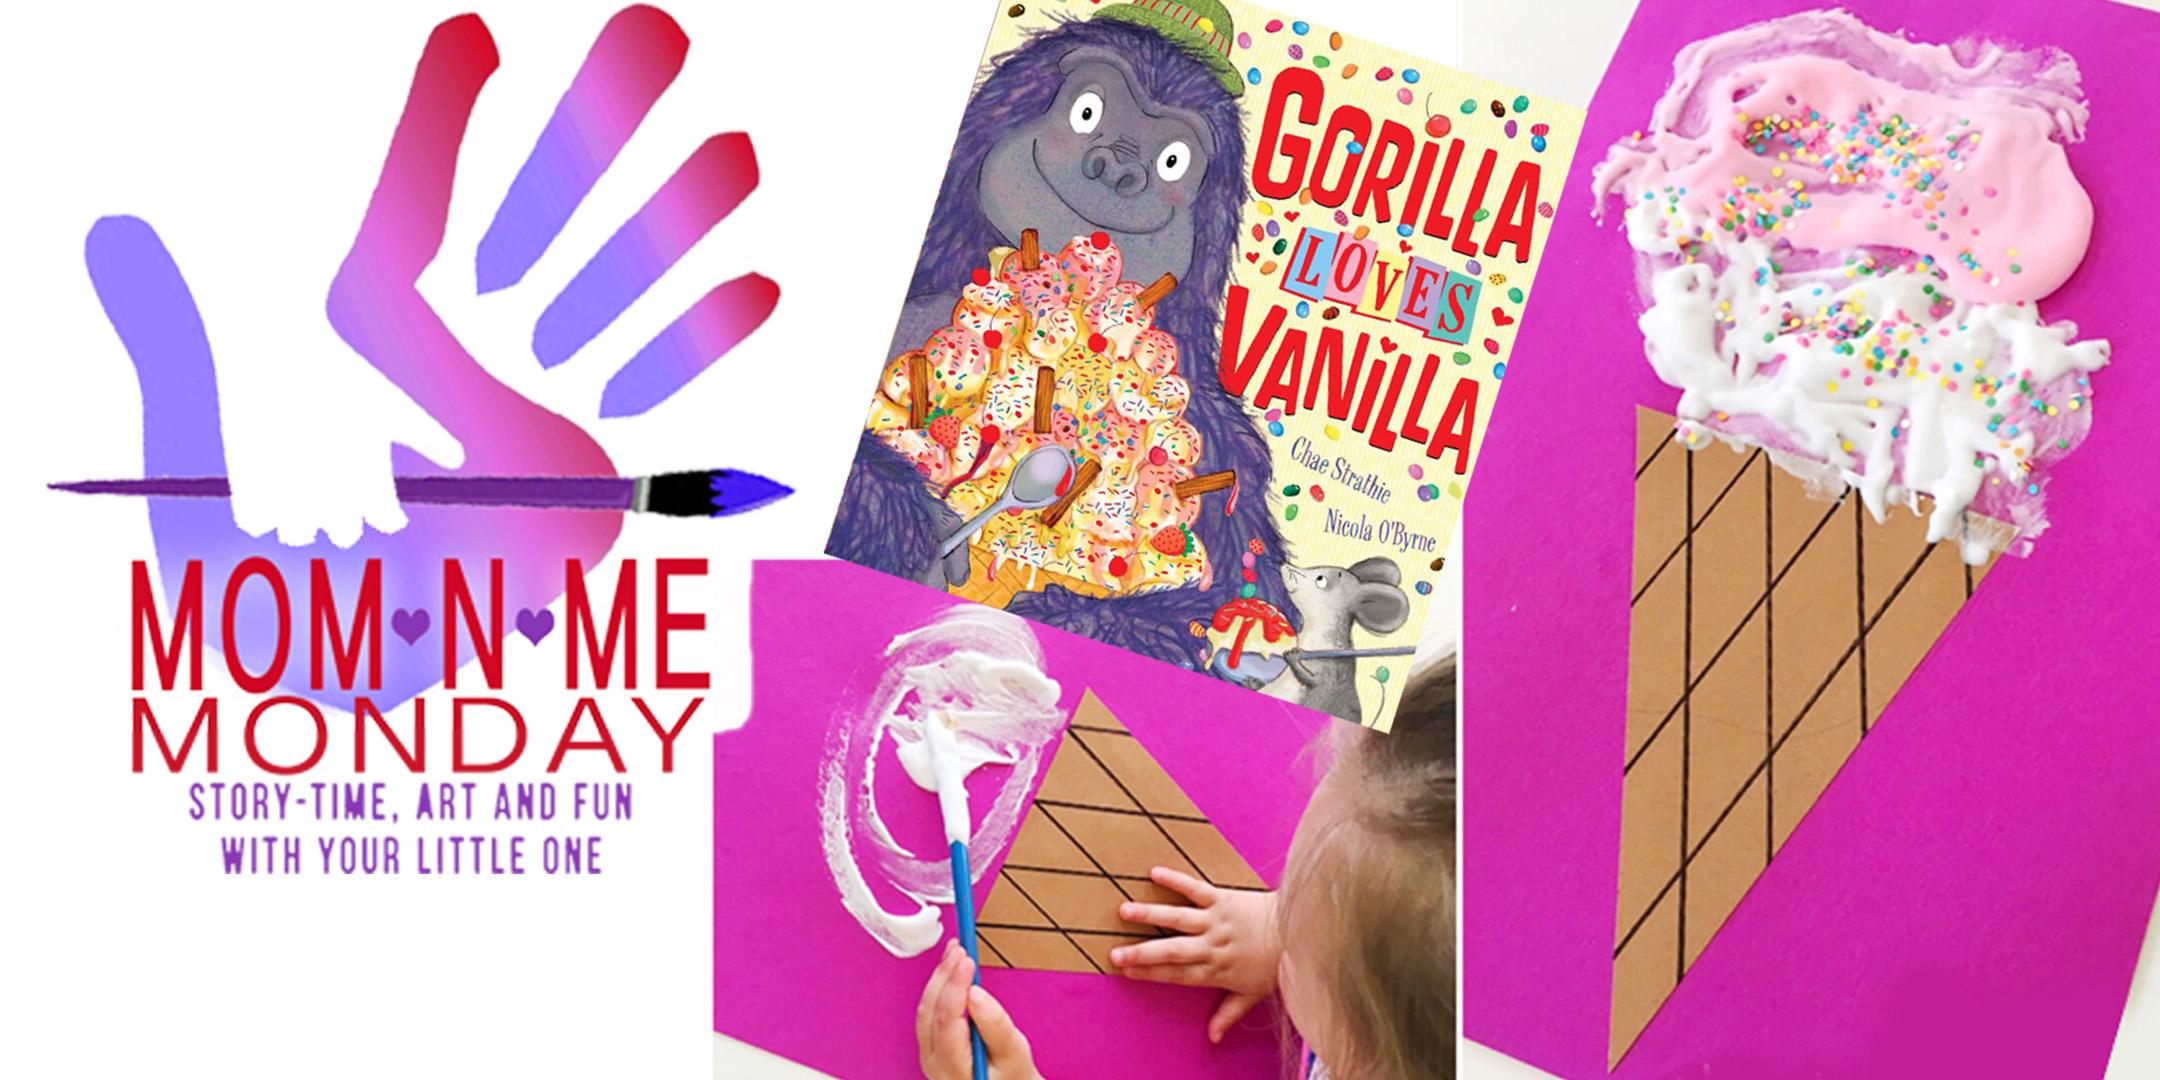 Gorilla-Vanilla-Eventbrite.jpg